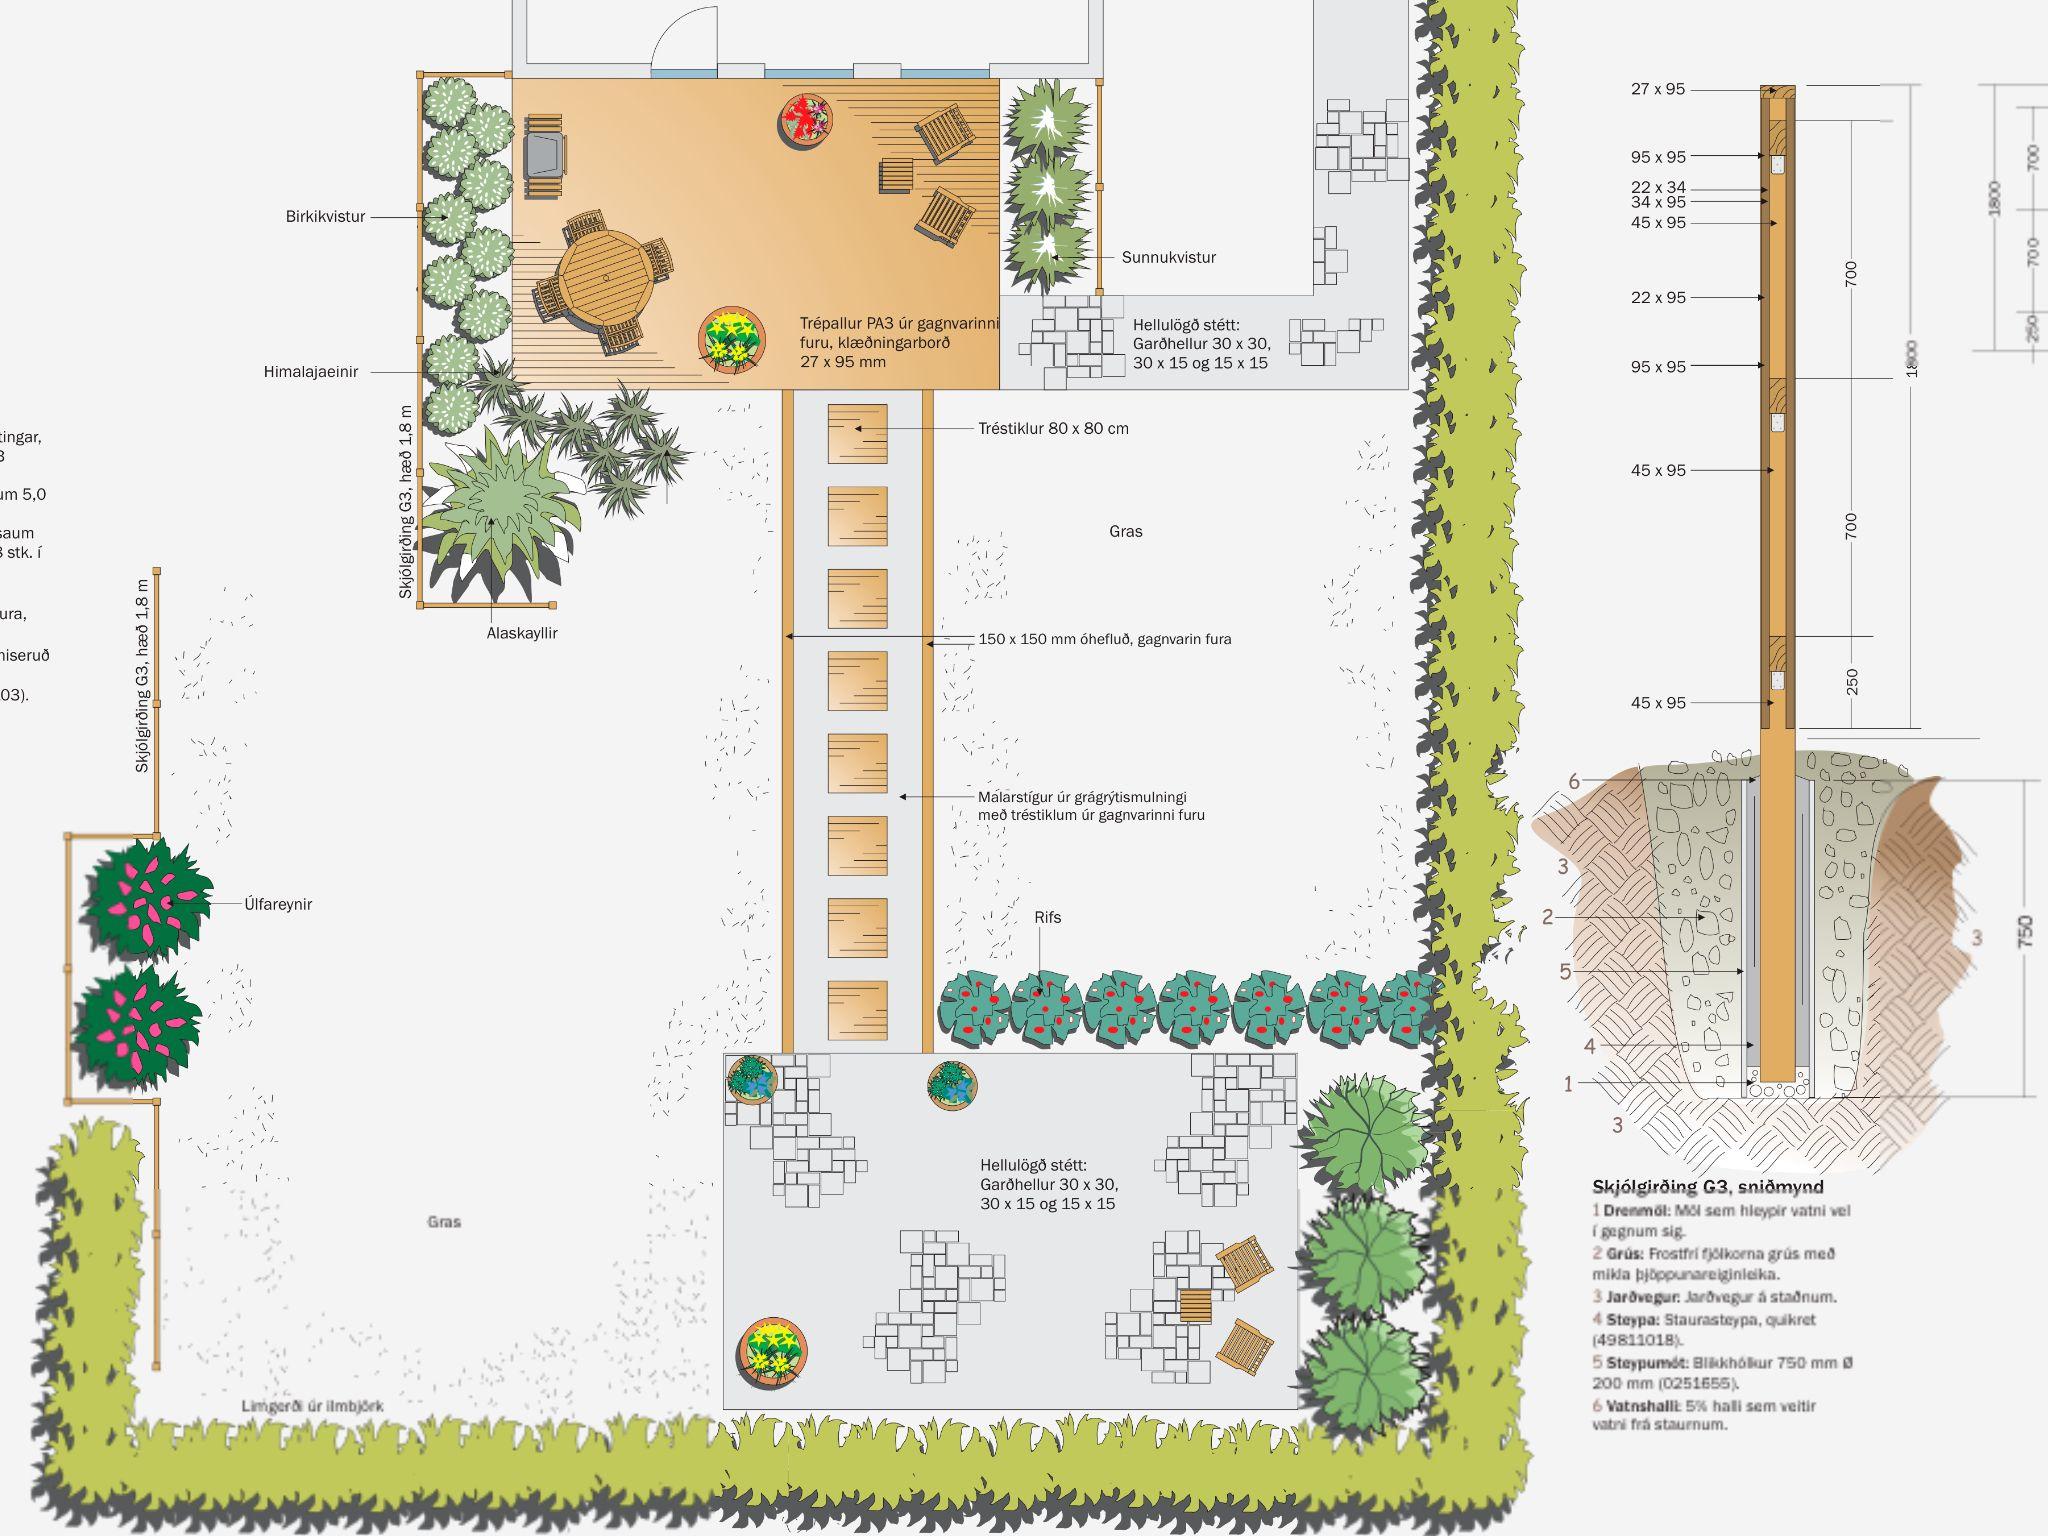 Autocad Landscape Design - Autocad - Pinterest - Autocad And